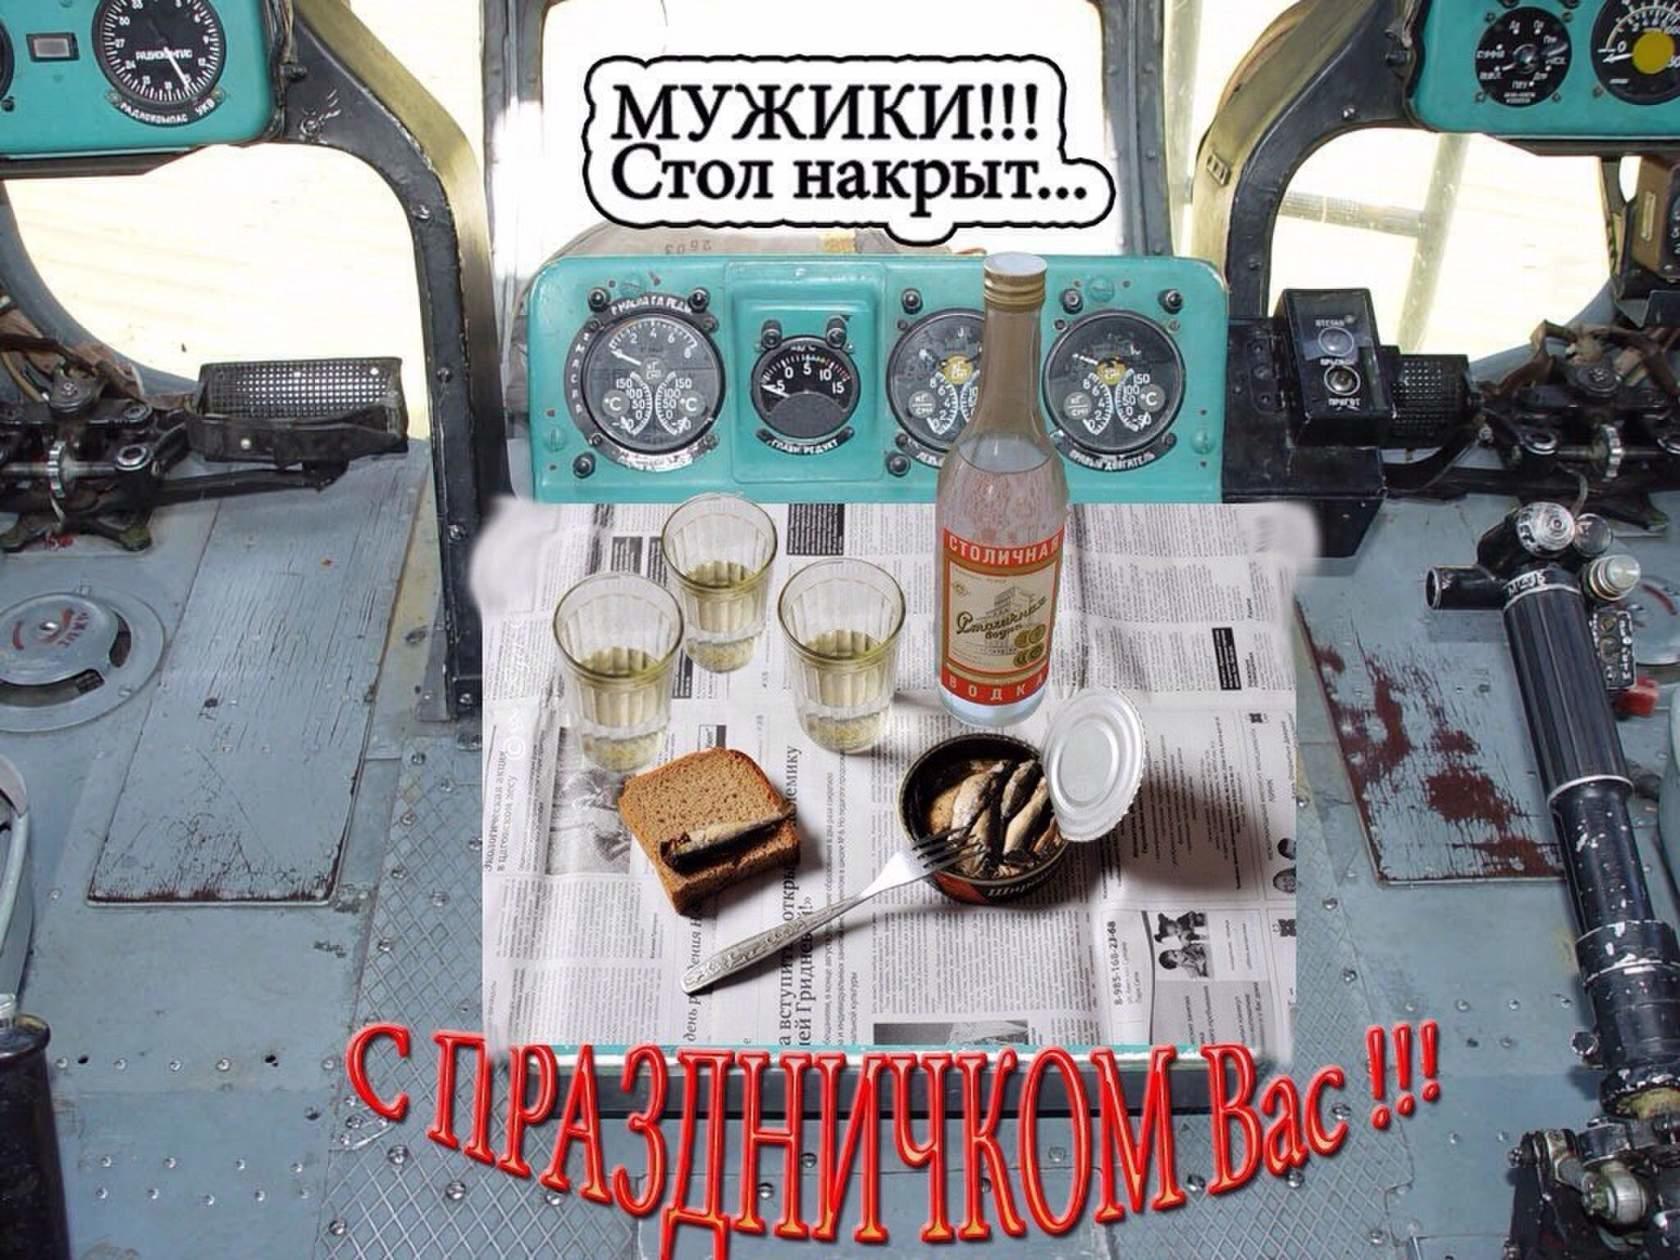 http://s1.uploads.ru/JLQ5f.jpg